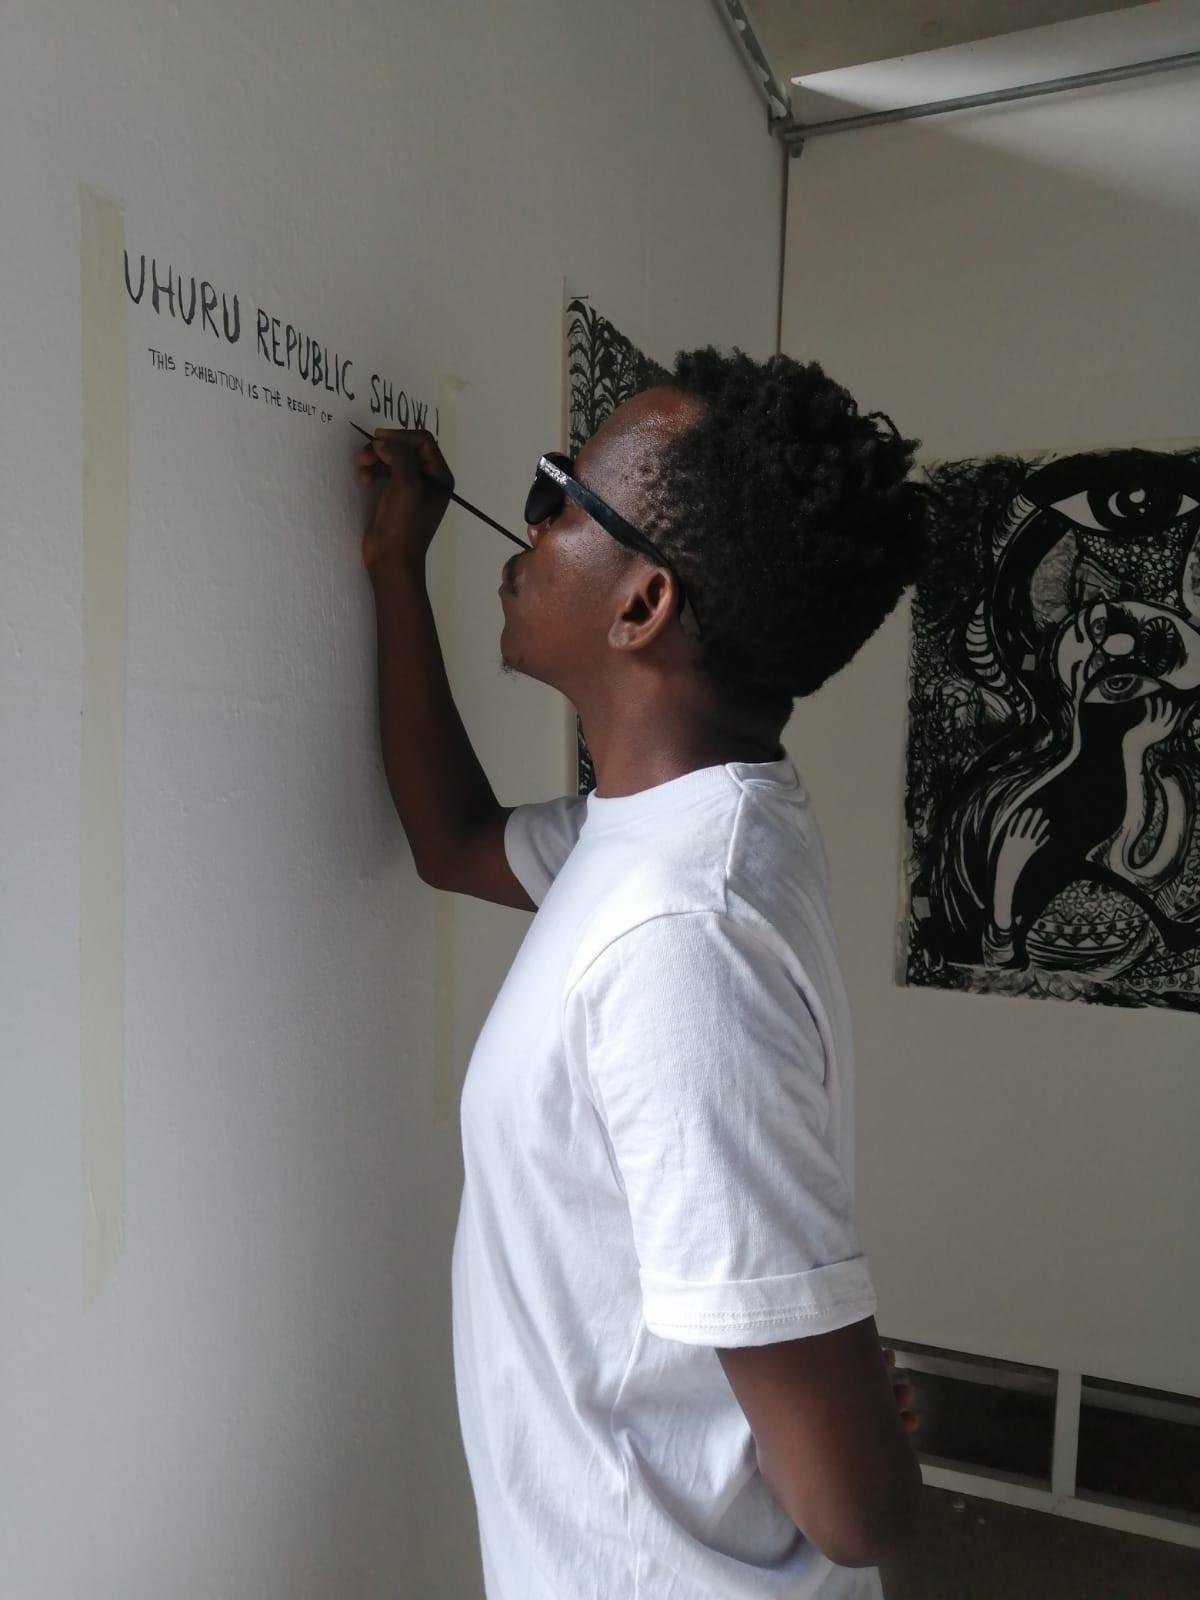 uhuru republic residenza mostra 2